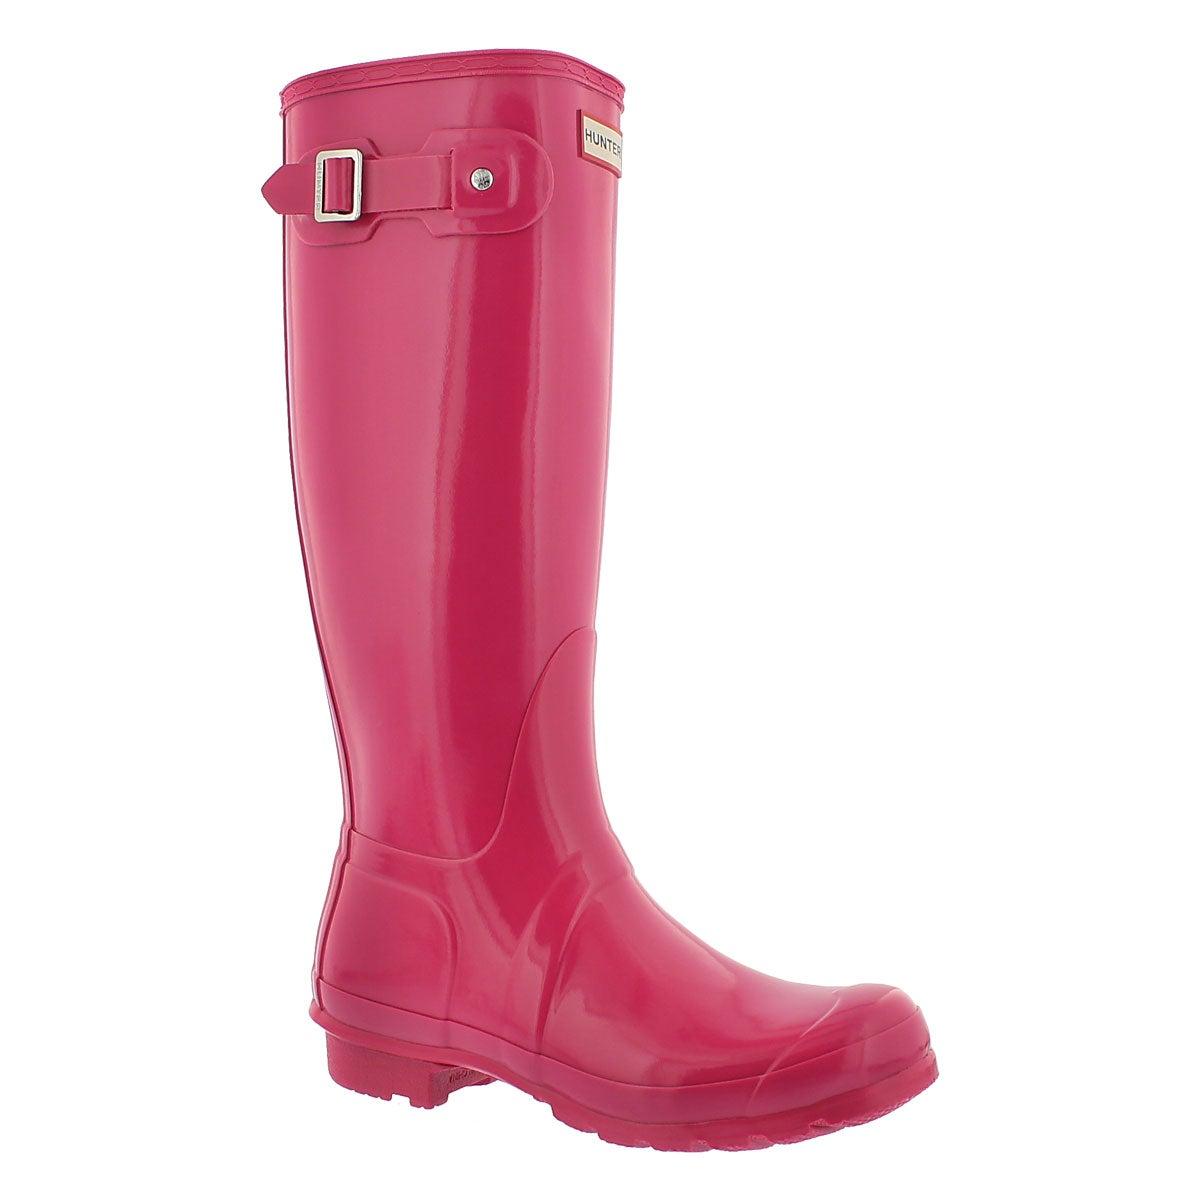 Lds Orig. Tall Gloss bright cerise boot